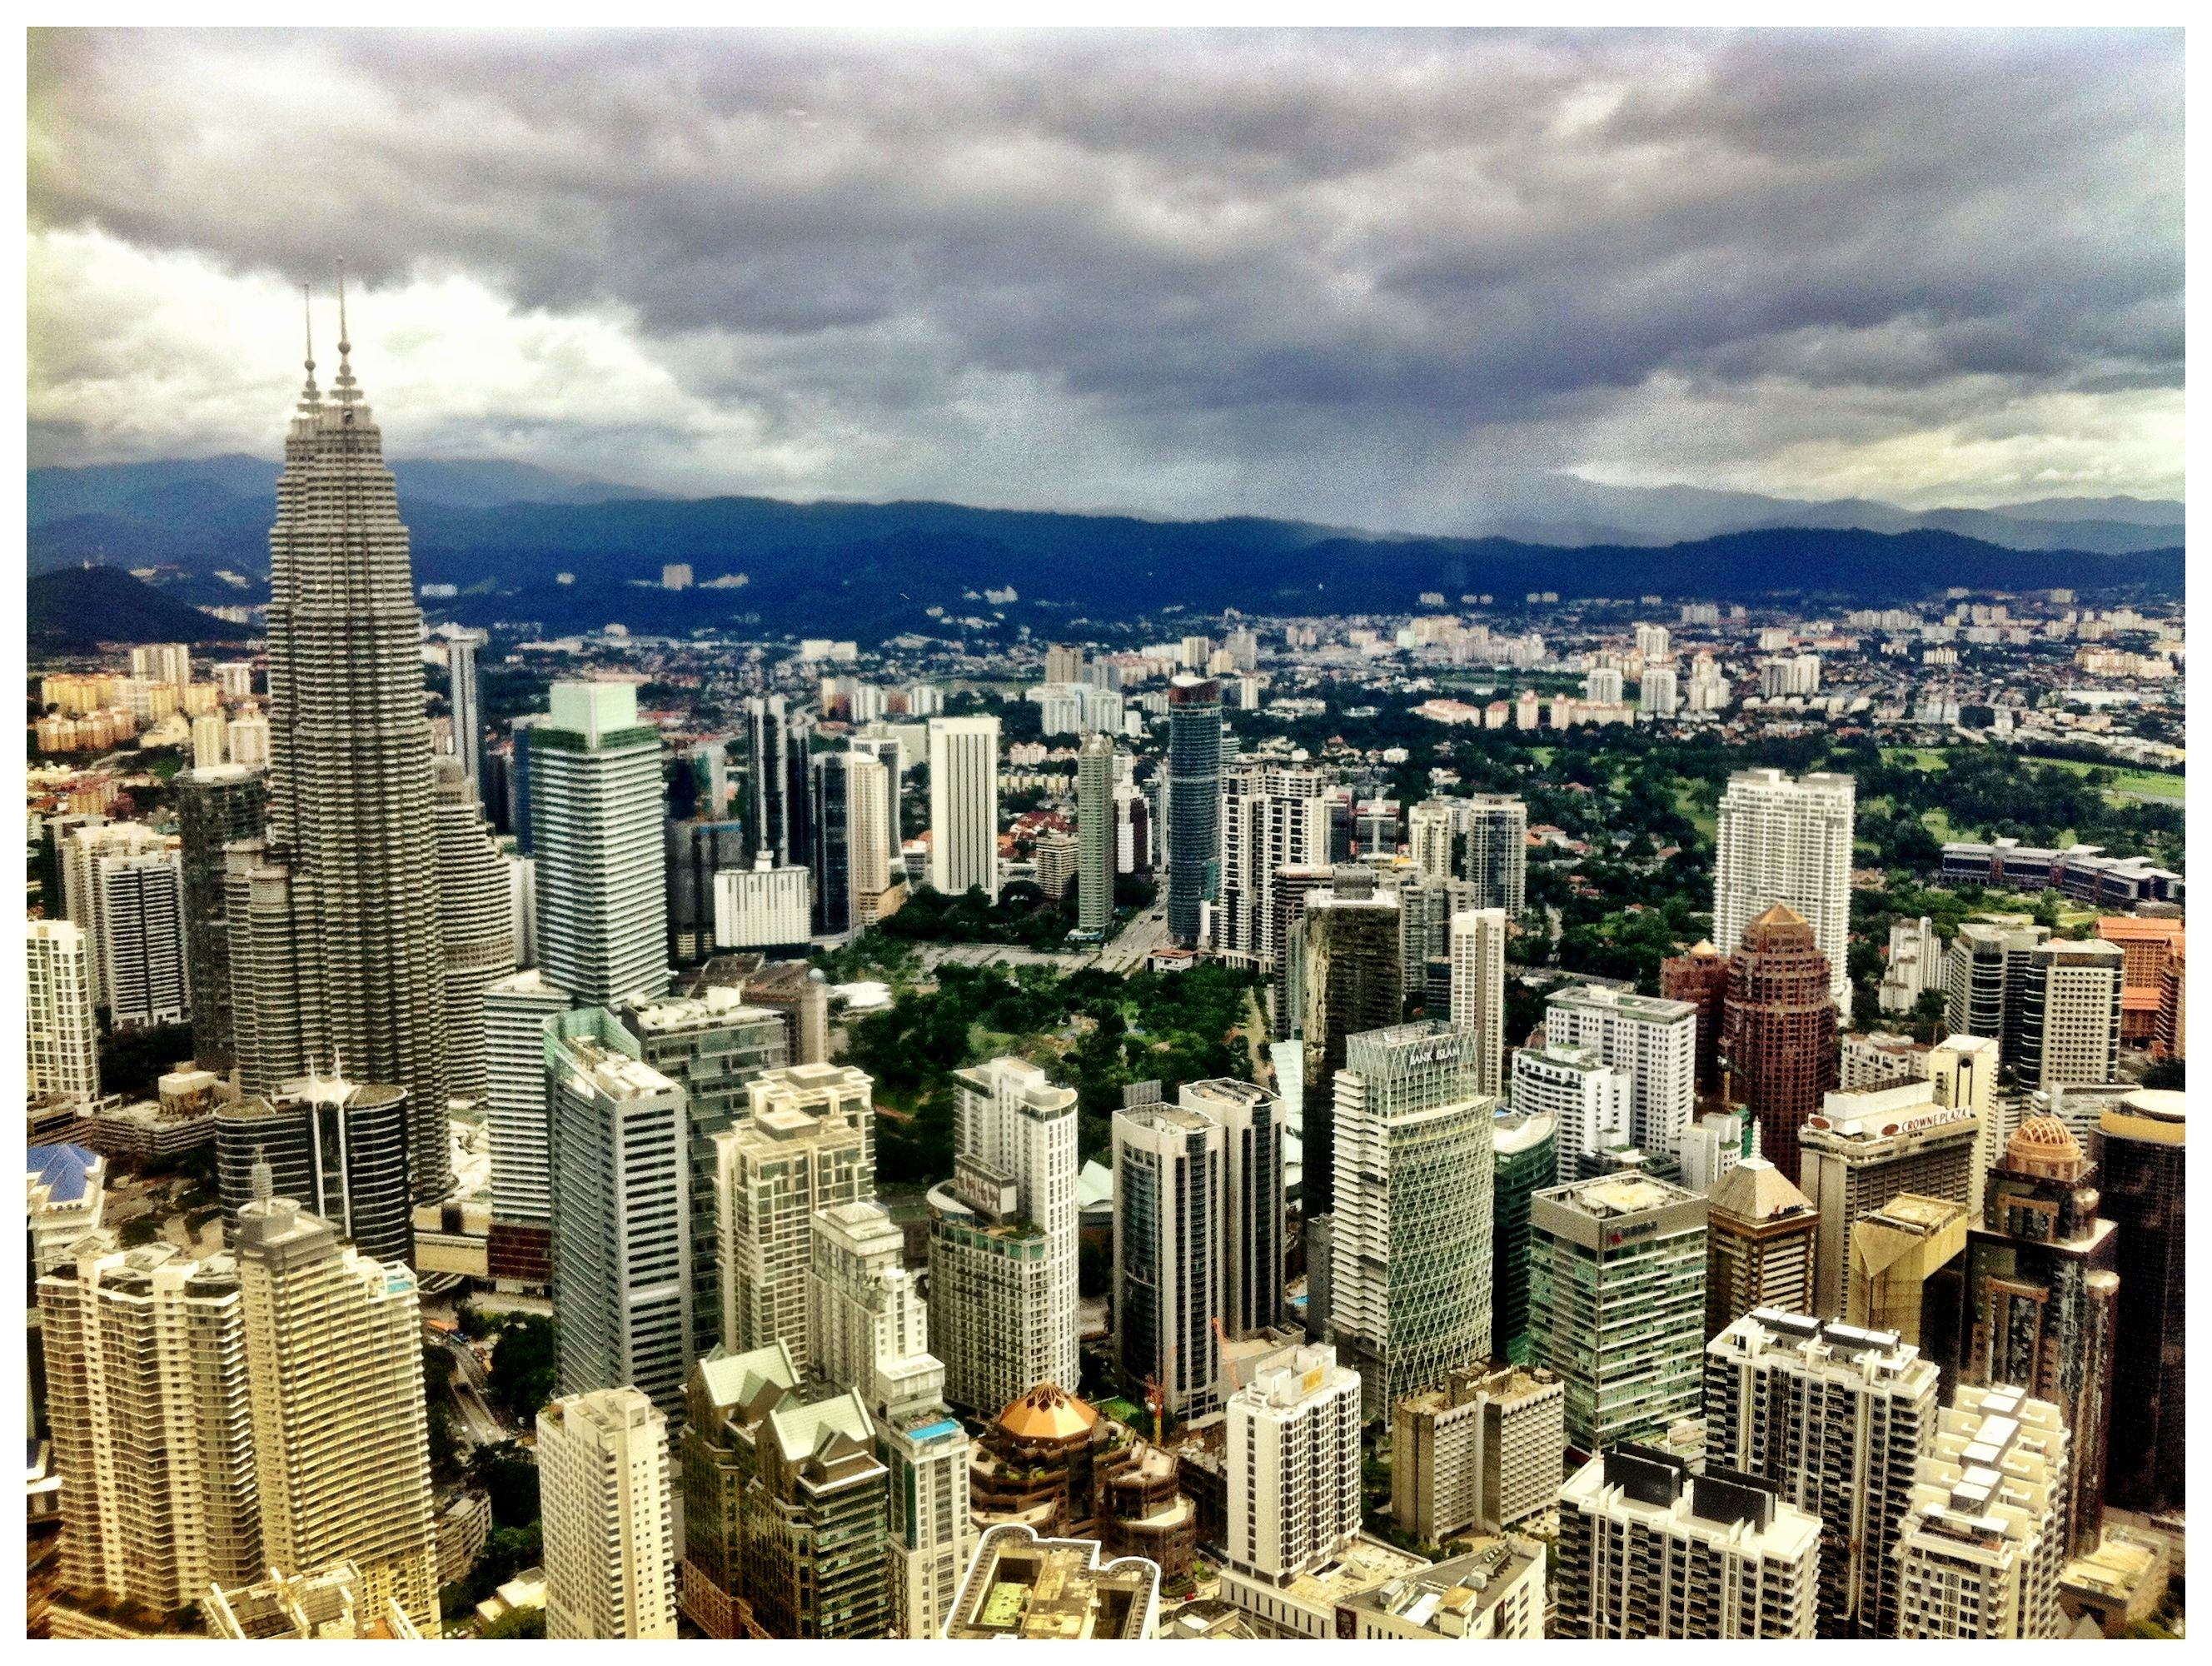 Malaysia, Kuala Lumpur, TV Tower